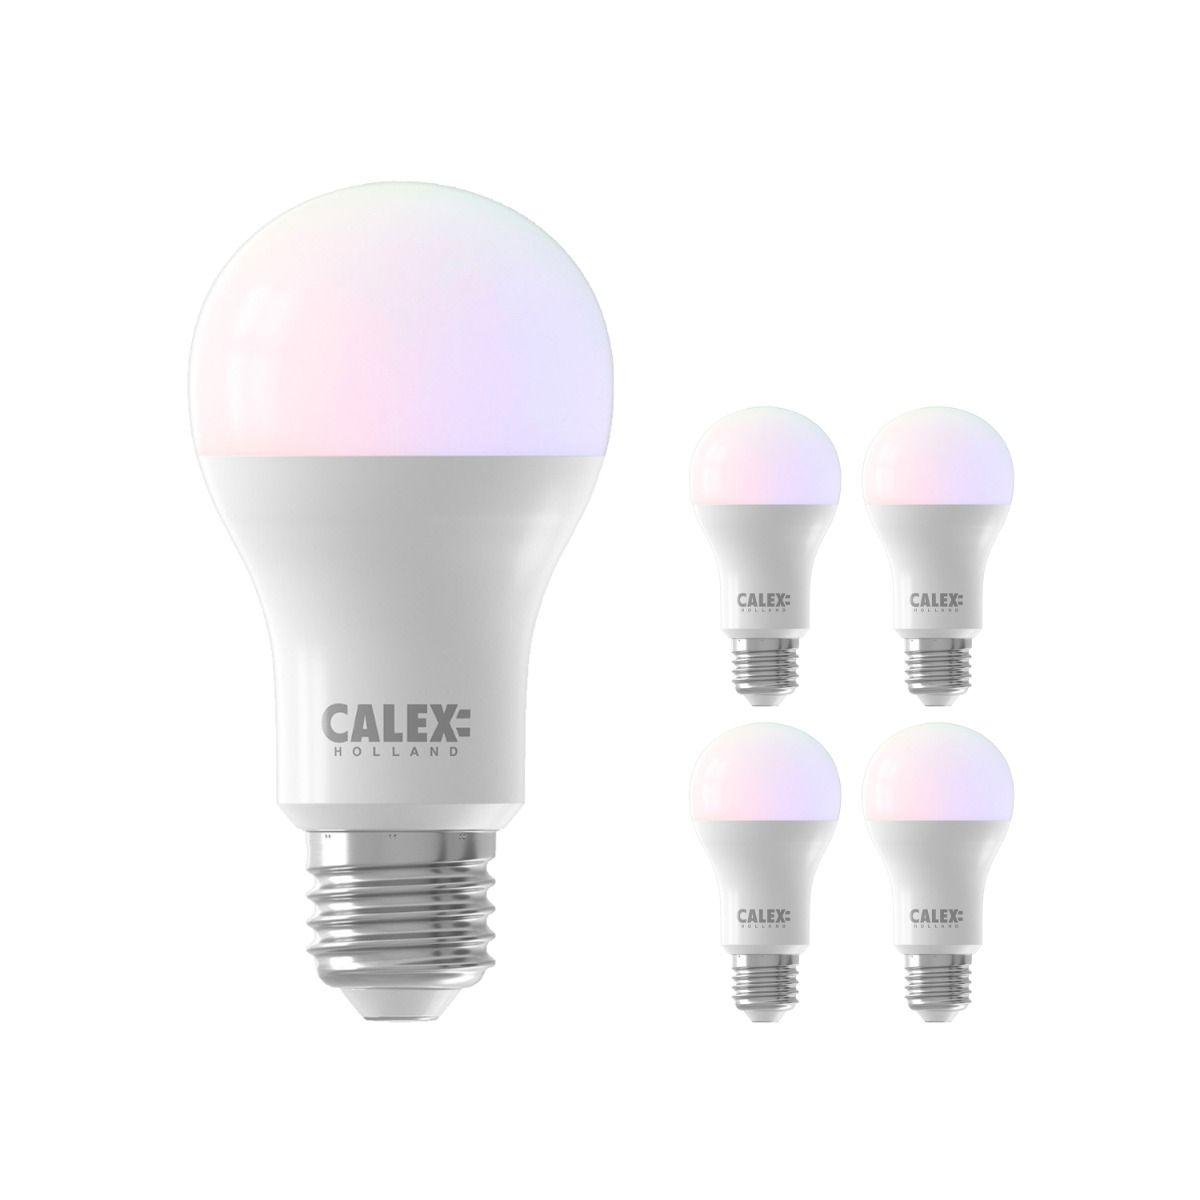 Fordelspakke 5x Calex Smart Standard LED Pære E27 8,5W 806lm 2200-4000K RGB + CCT | Tuya Wi-Fi